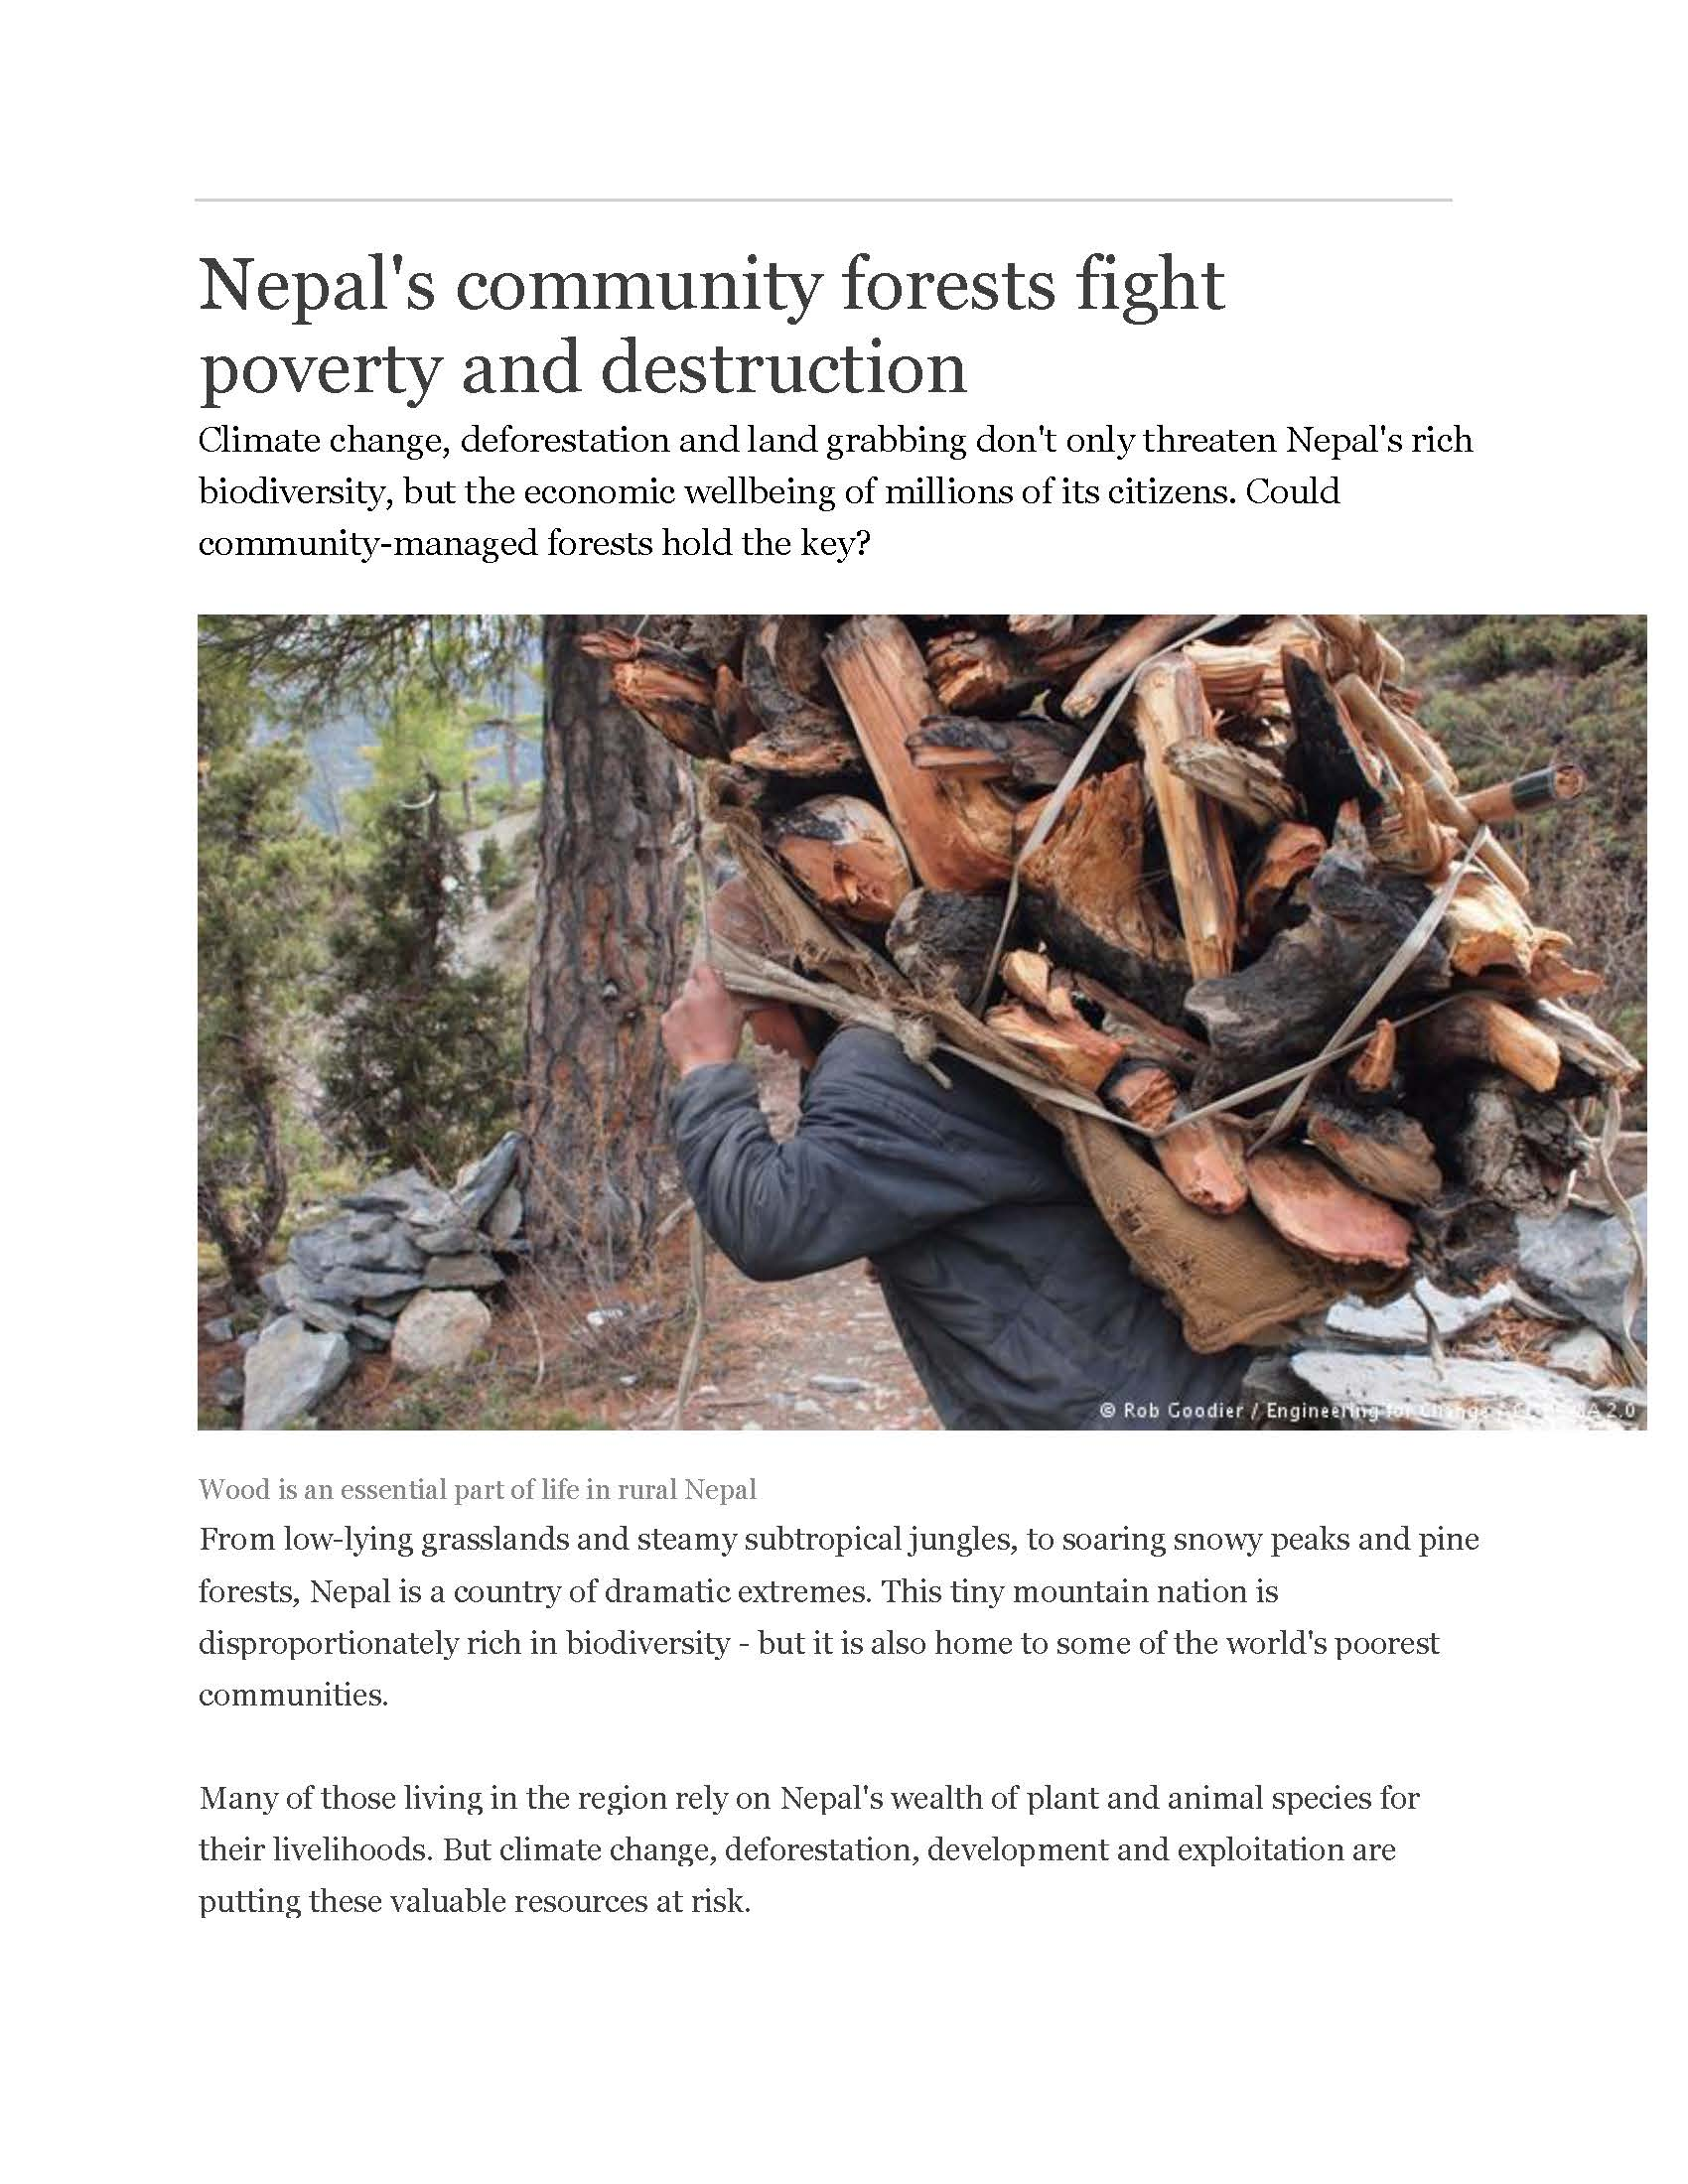 Nepal biodiversity strategy 2017